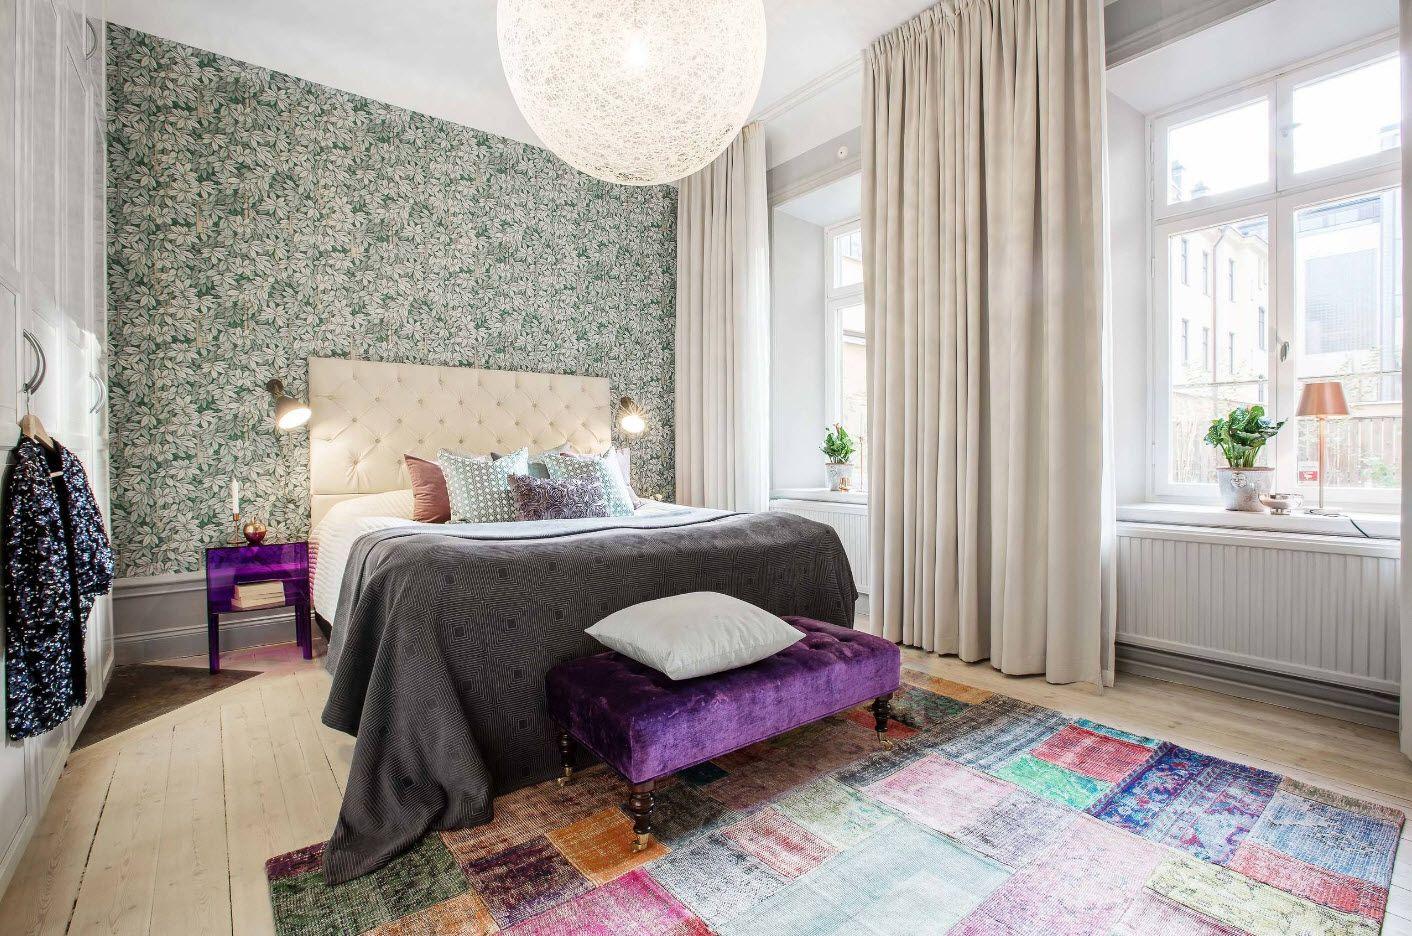 Modern Bedroom Interior Decoration & Design Ideas 2017. Velvet ottoman and the textured wallpaper